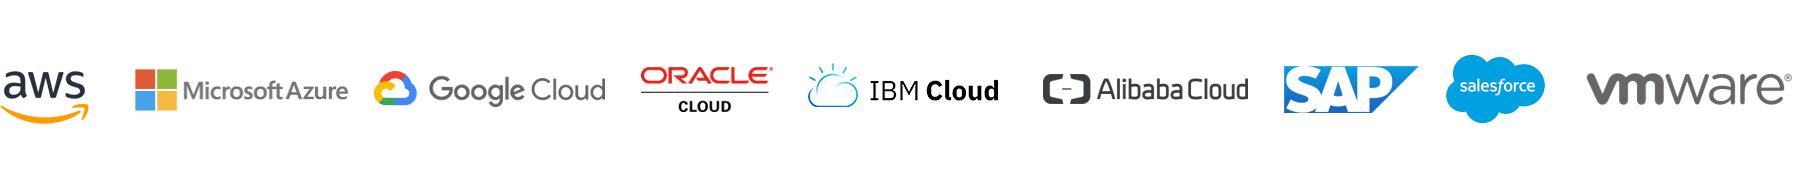 Major Cloud Providers